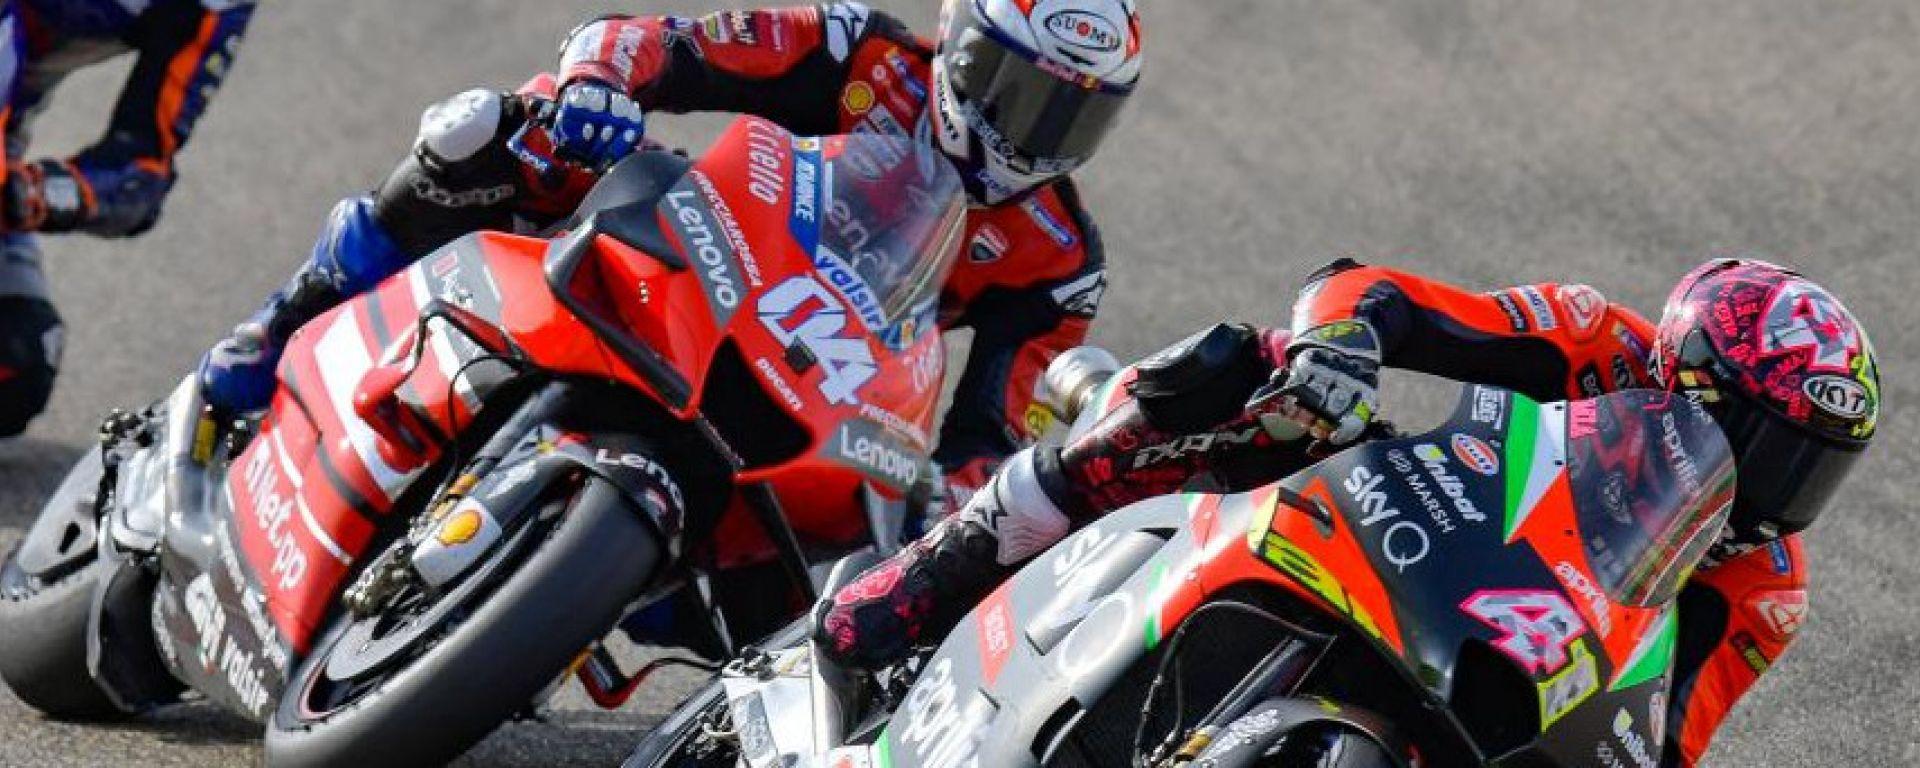 MotoGP Teruel 2020, Aragon, Andrea Dovizioso (Ducati) segue Aleix Espargarò (Aprilia)